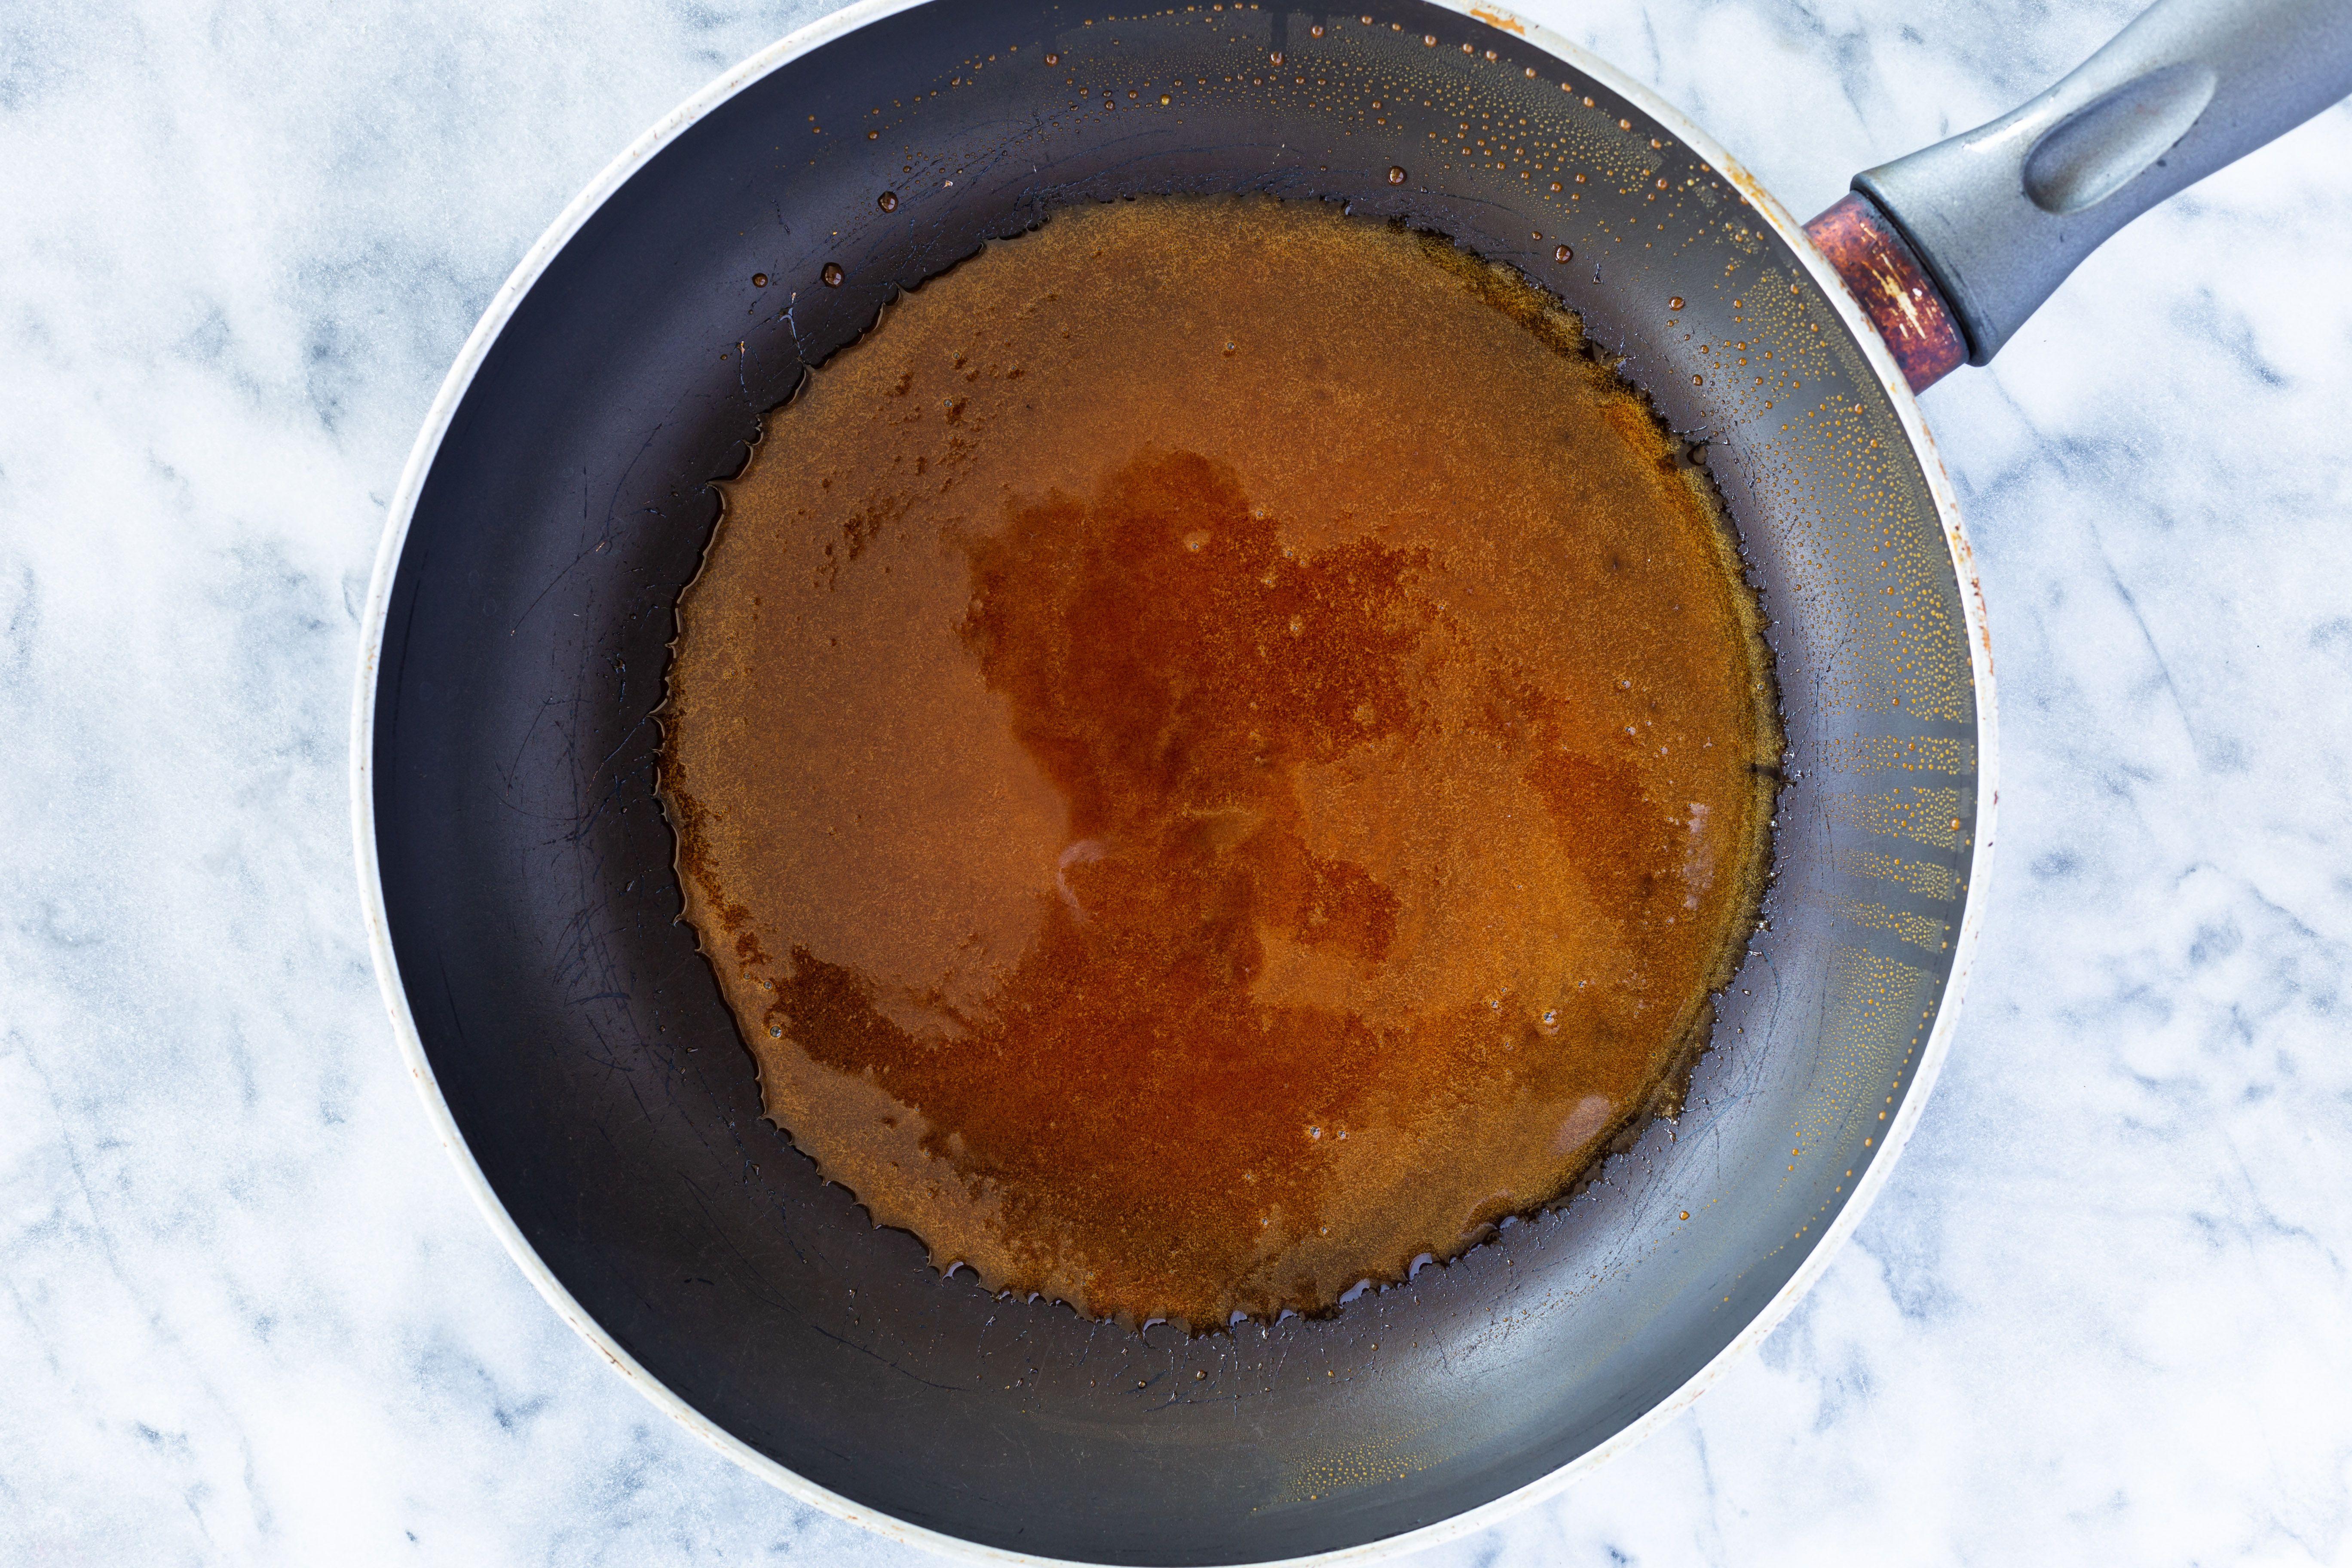 caramelized sugar in a skillet